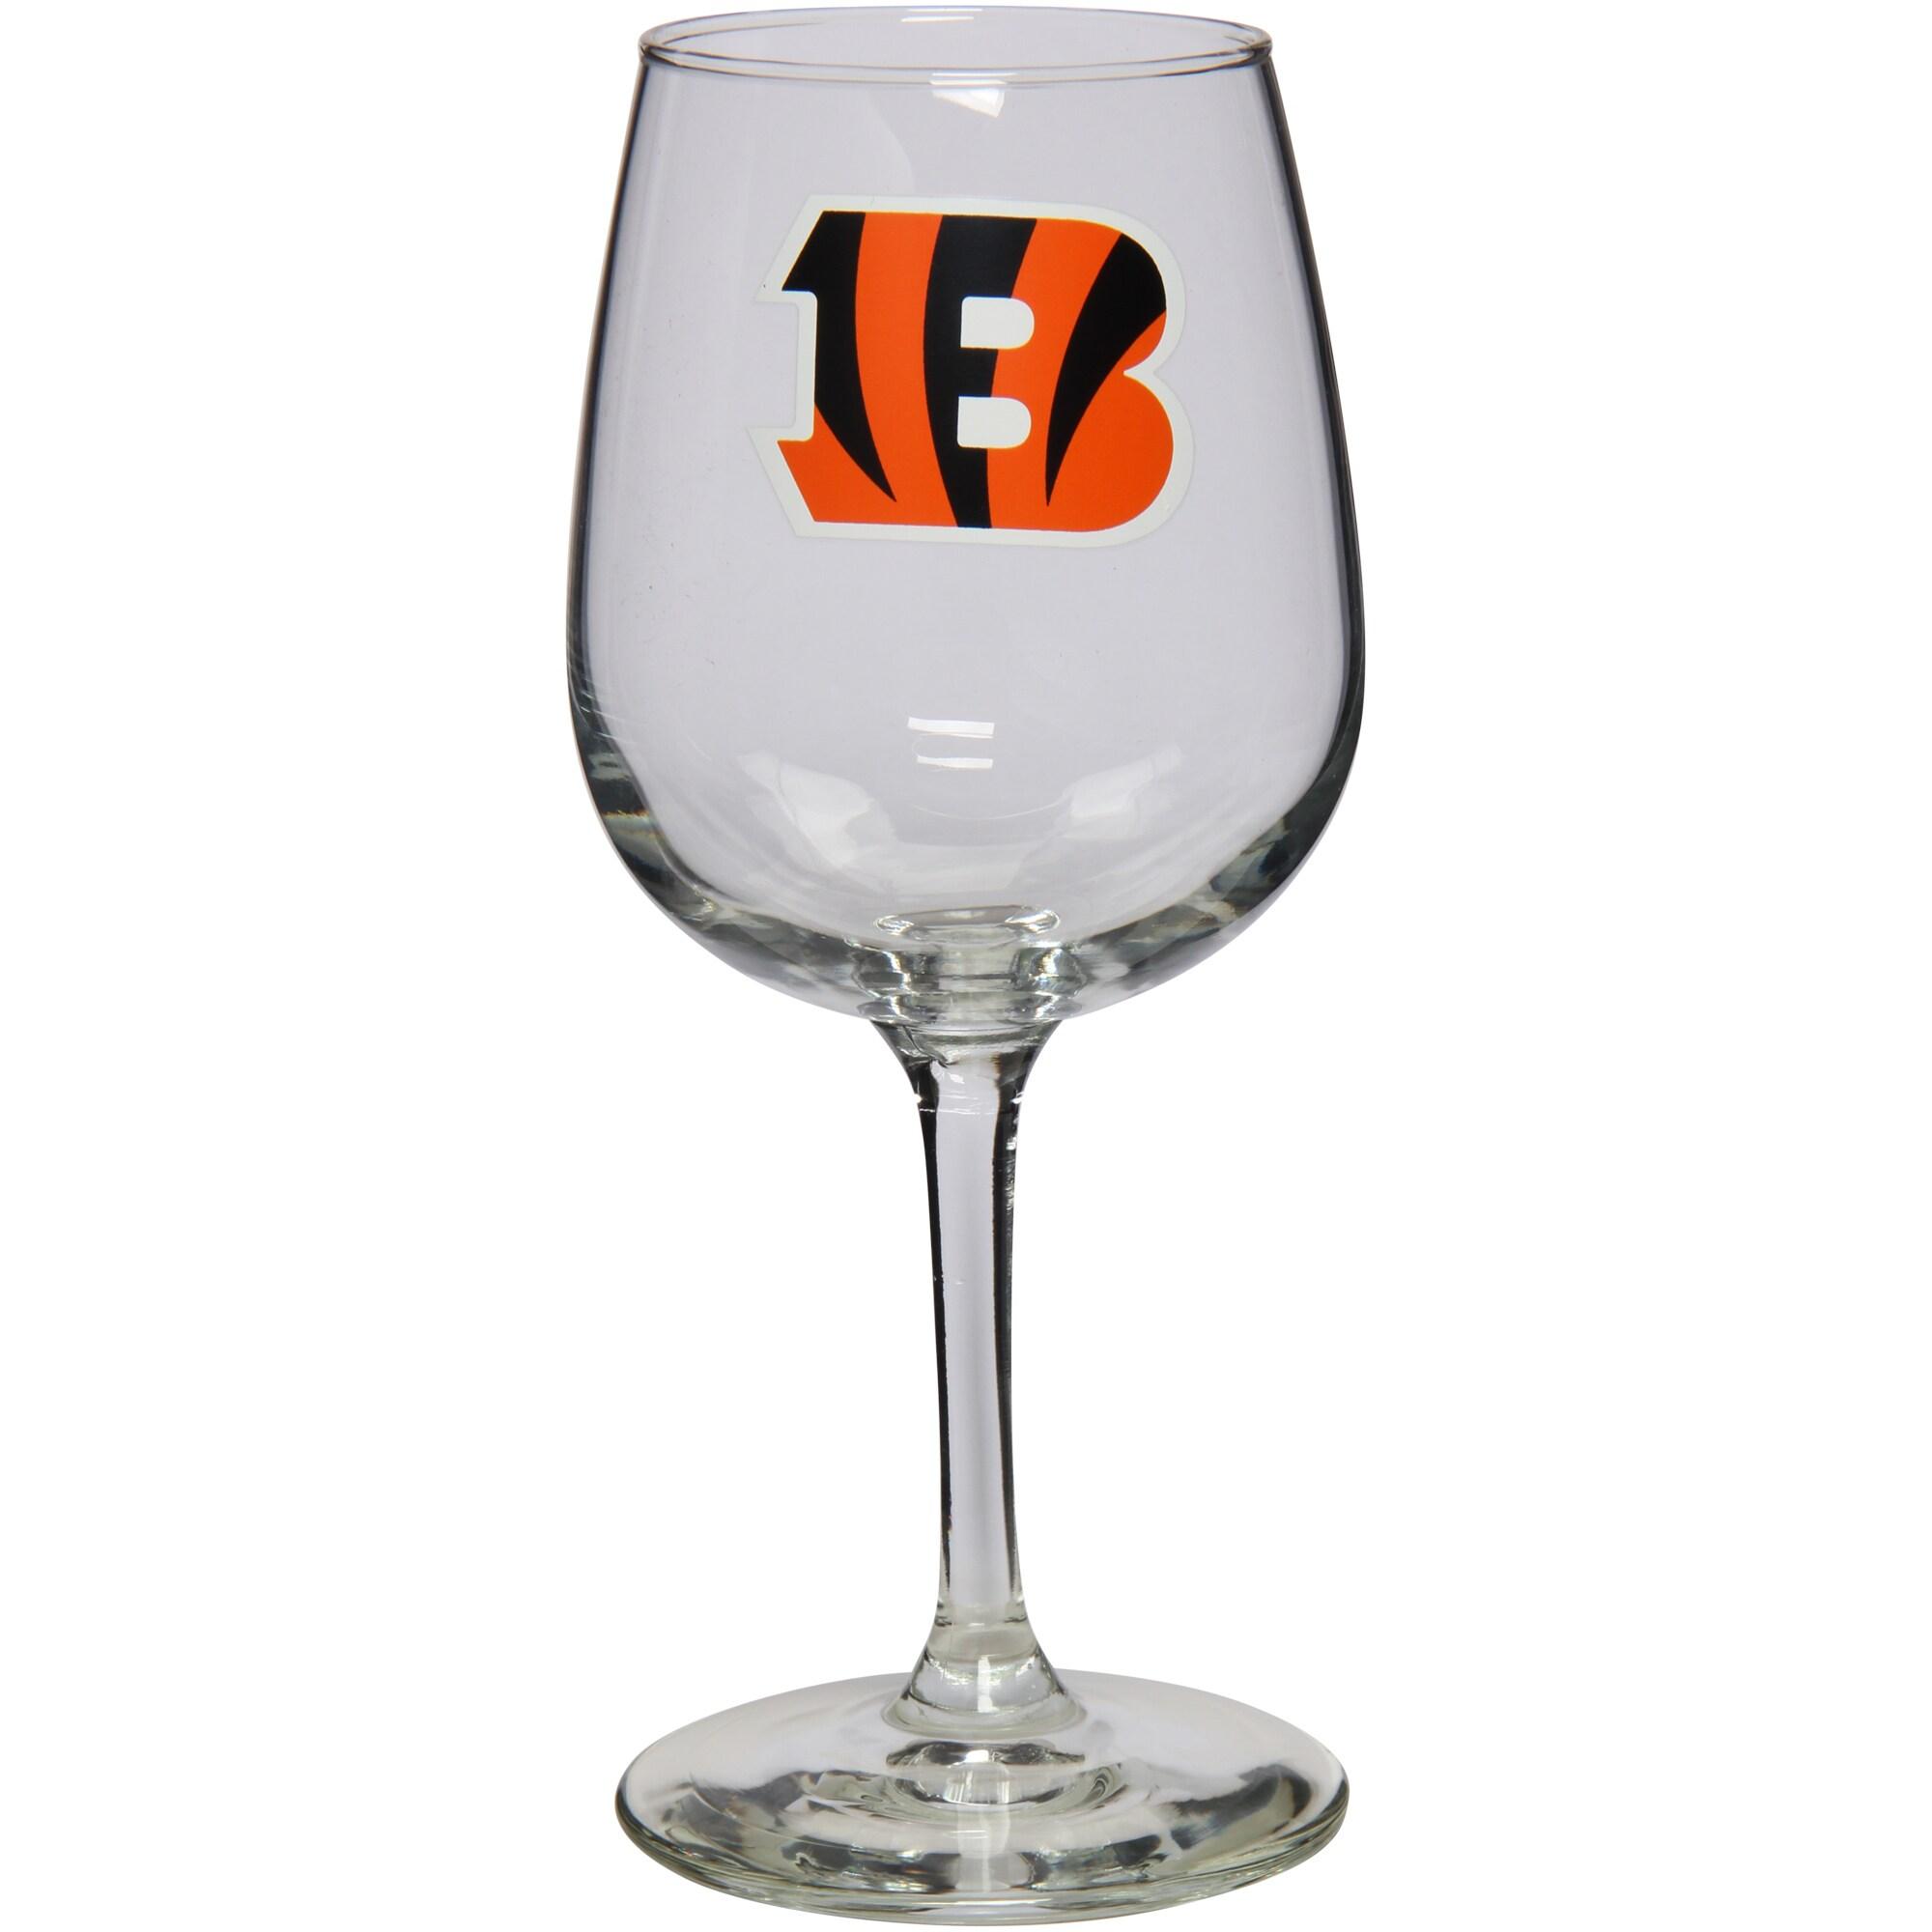 Cincinnati Bengals 12oz. Stemmed Wine Glass